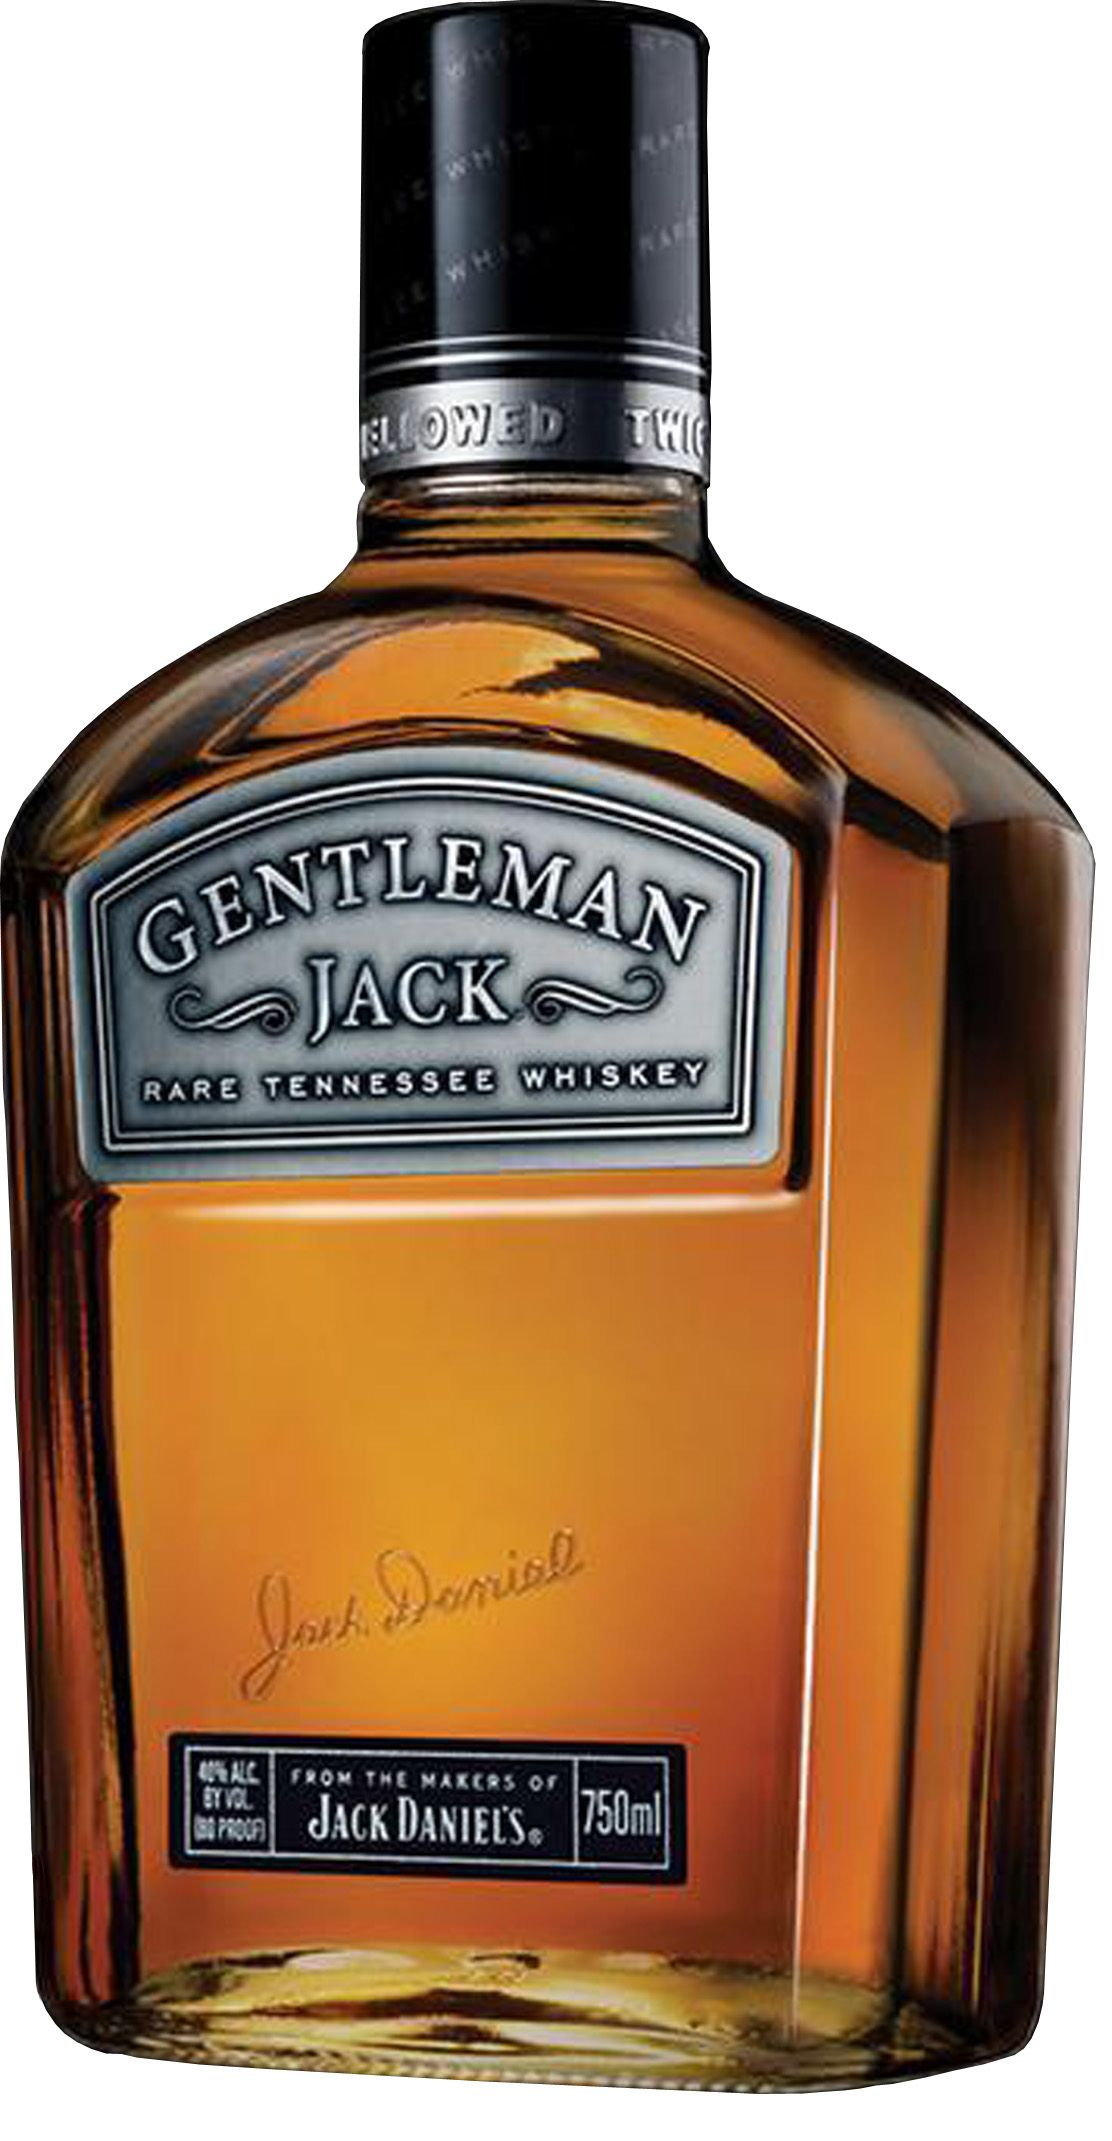 Gentleman Jack ! Drink less, drink better! (Says rich)